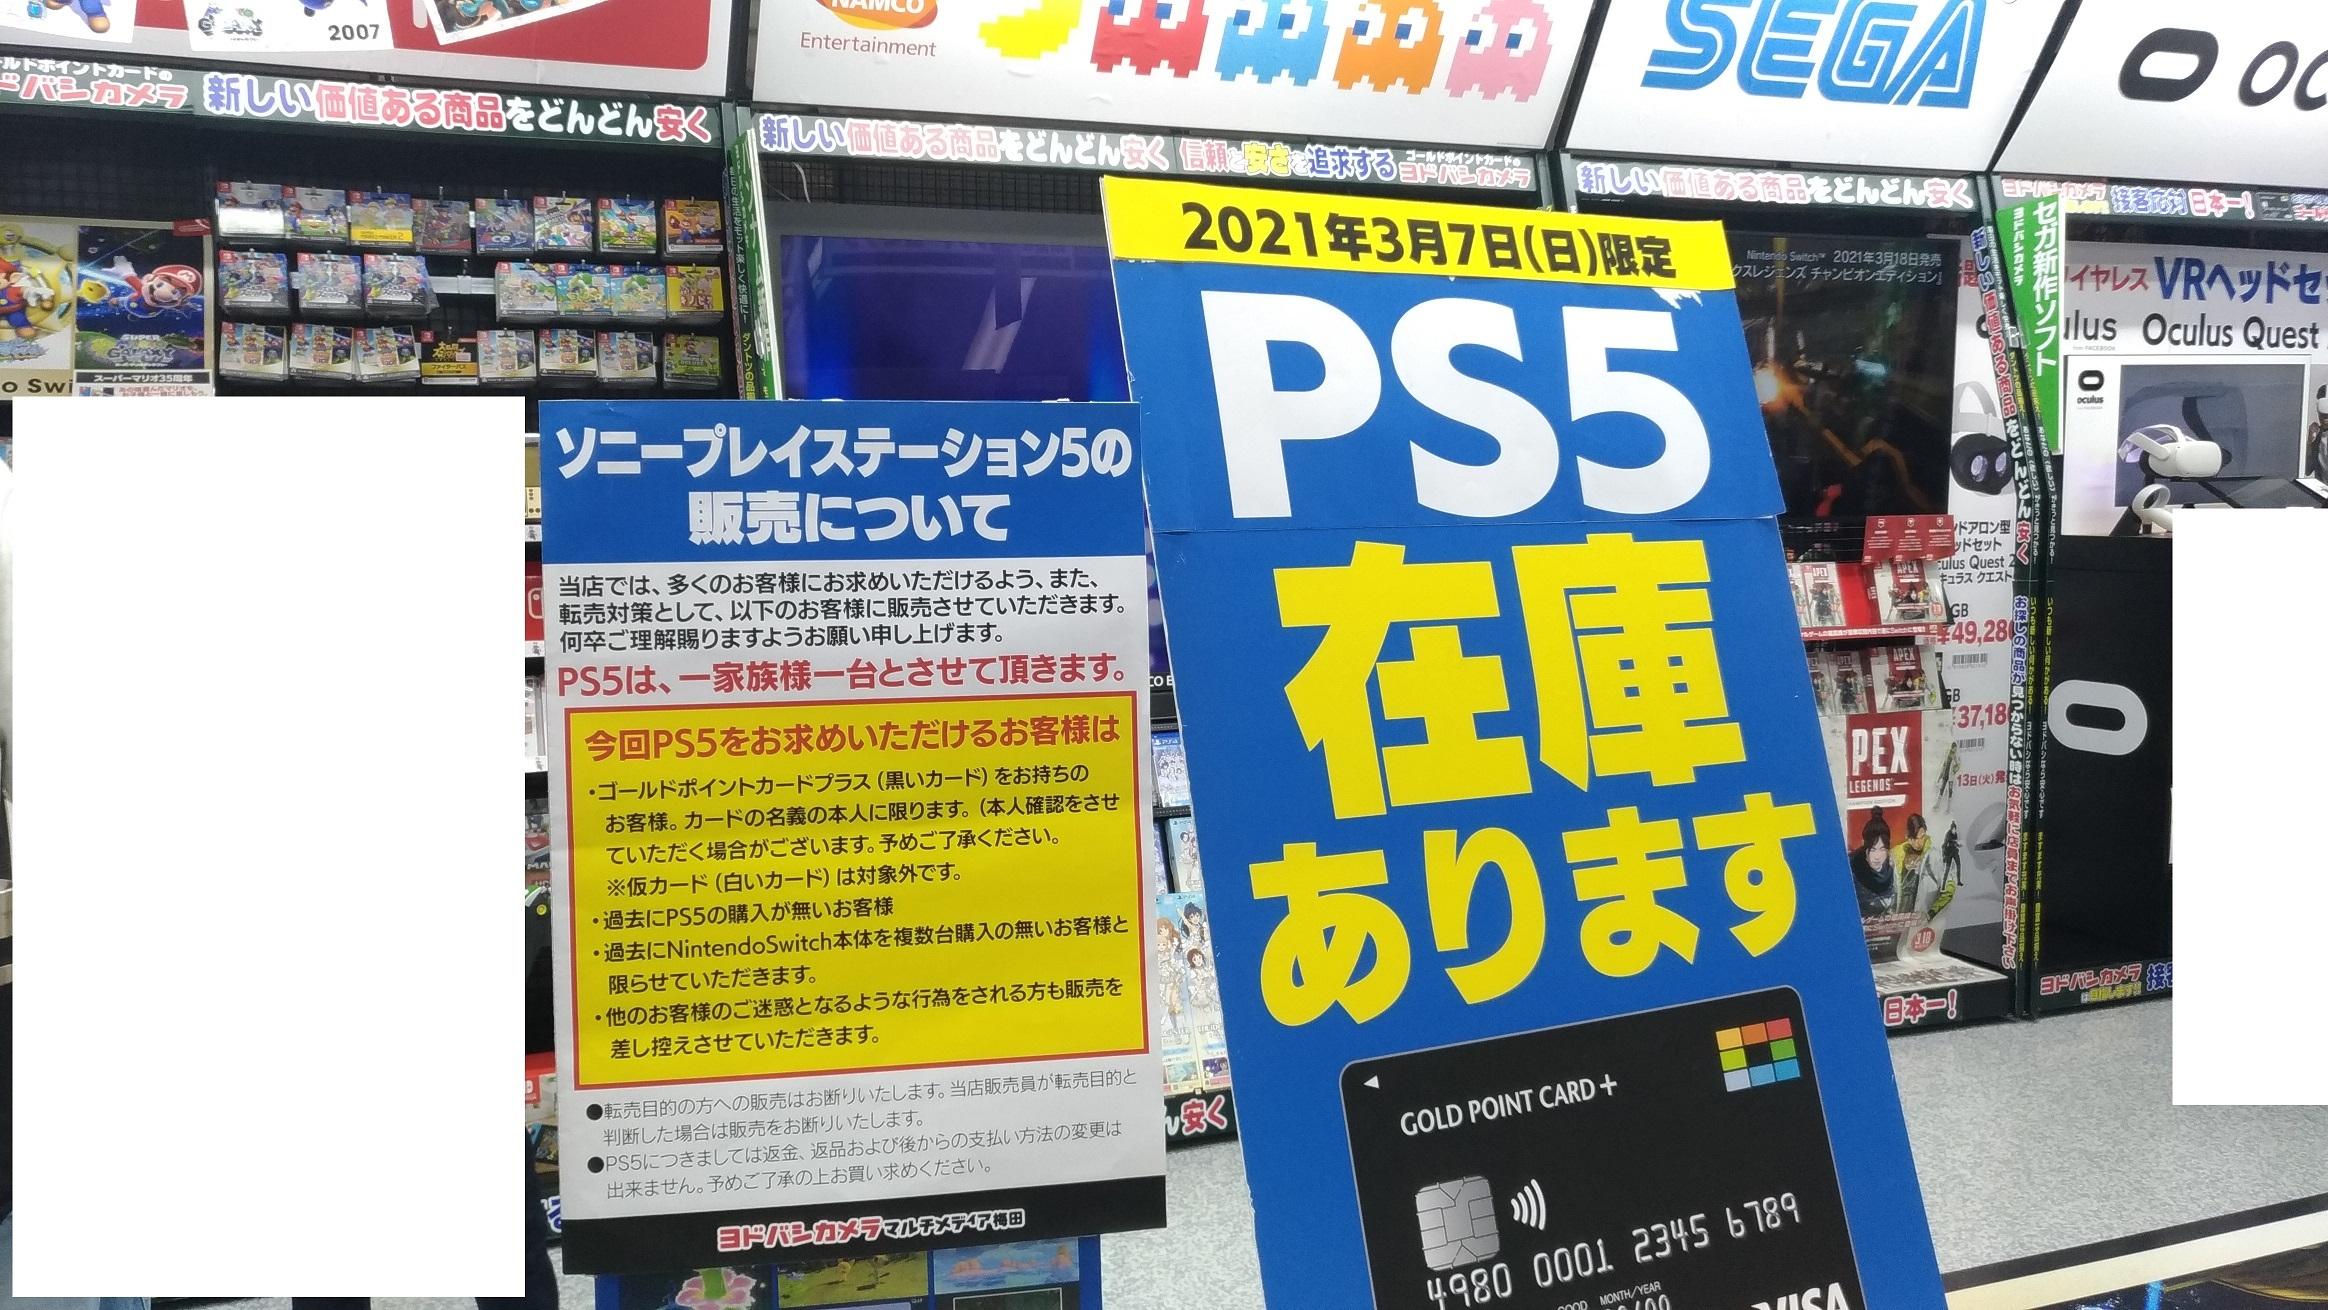 ps5_0307_2021_umeda_osaka1.jpg